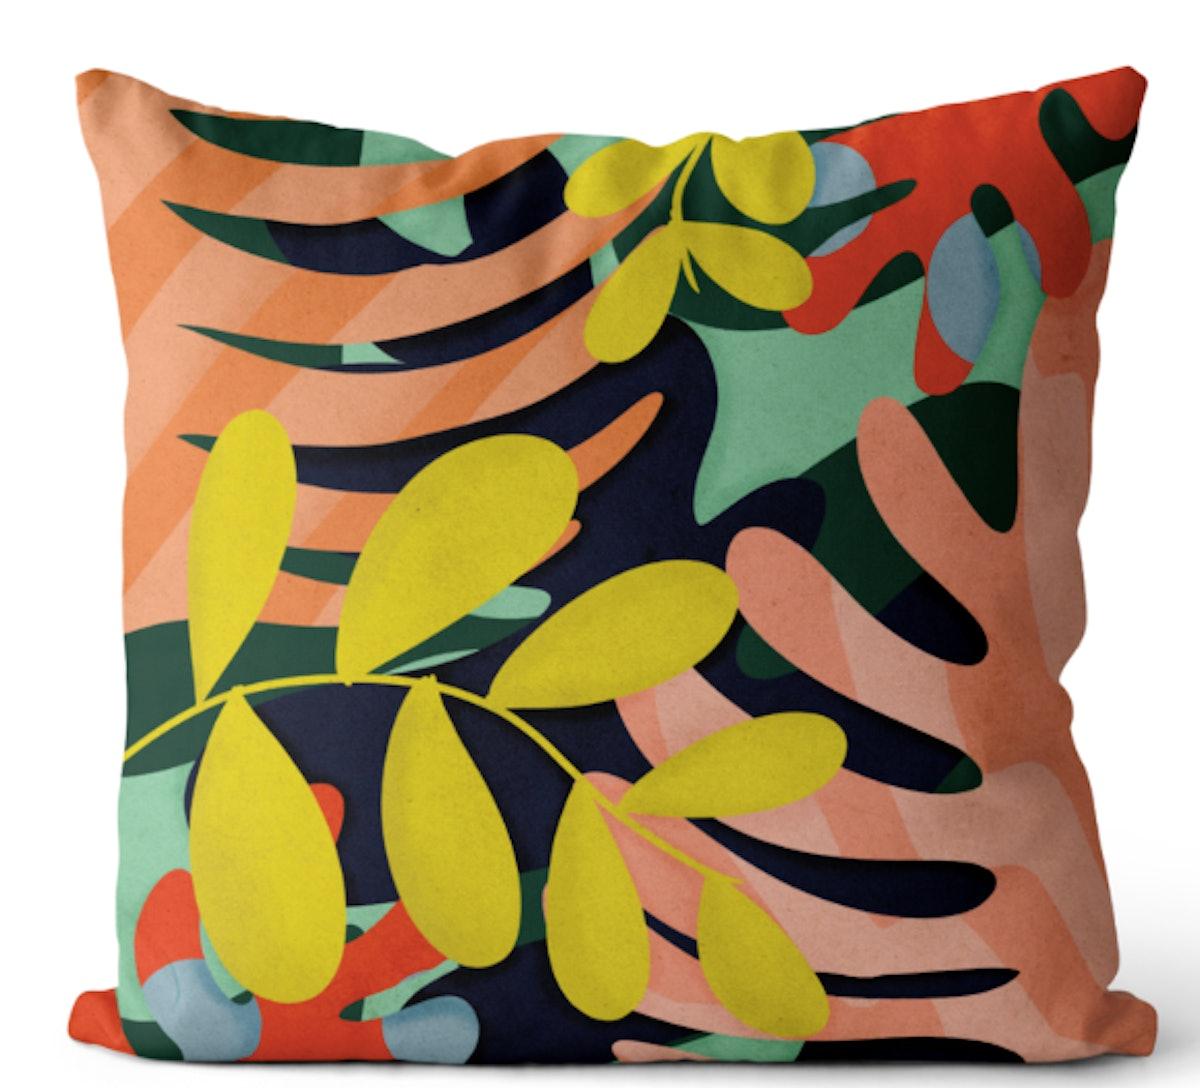 Blooming Pillow